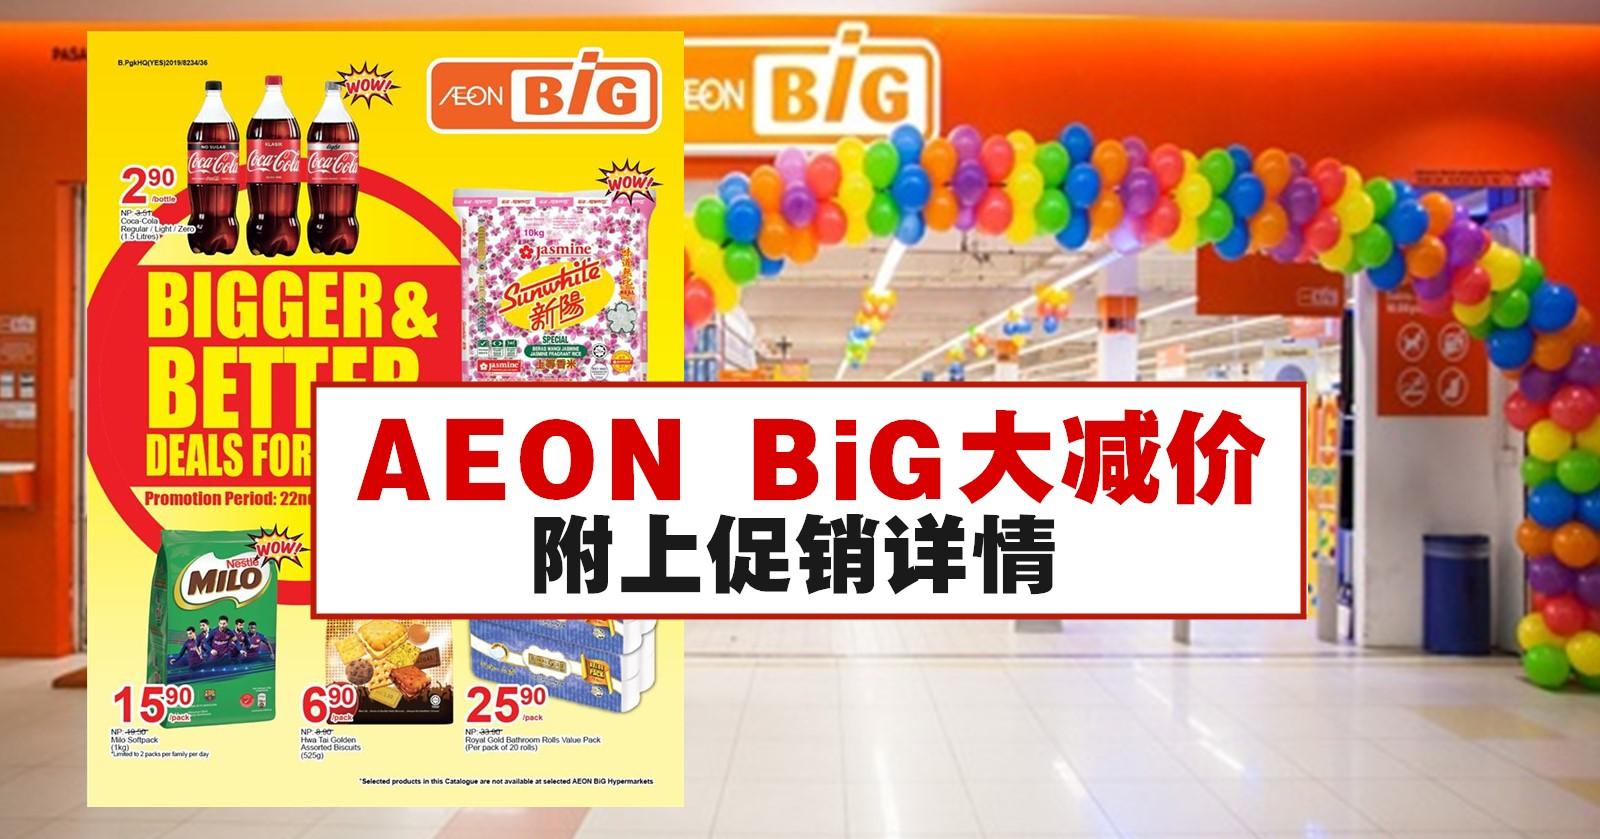 AEON BiG大减价